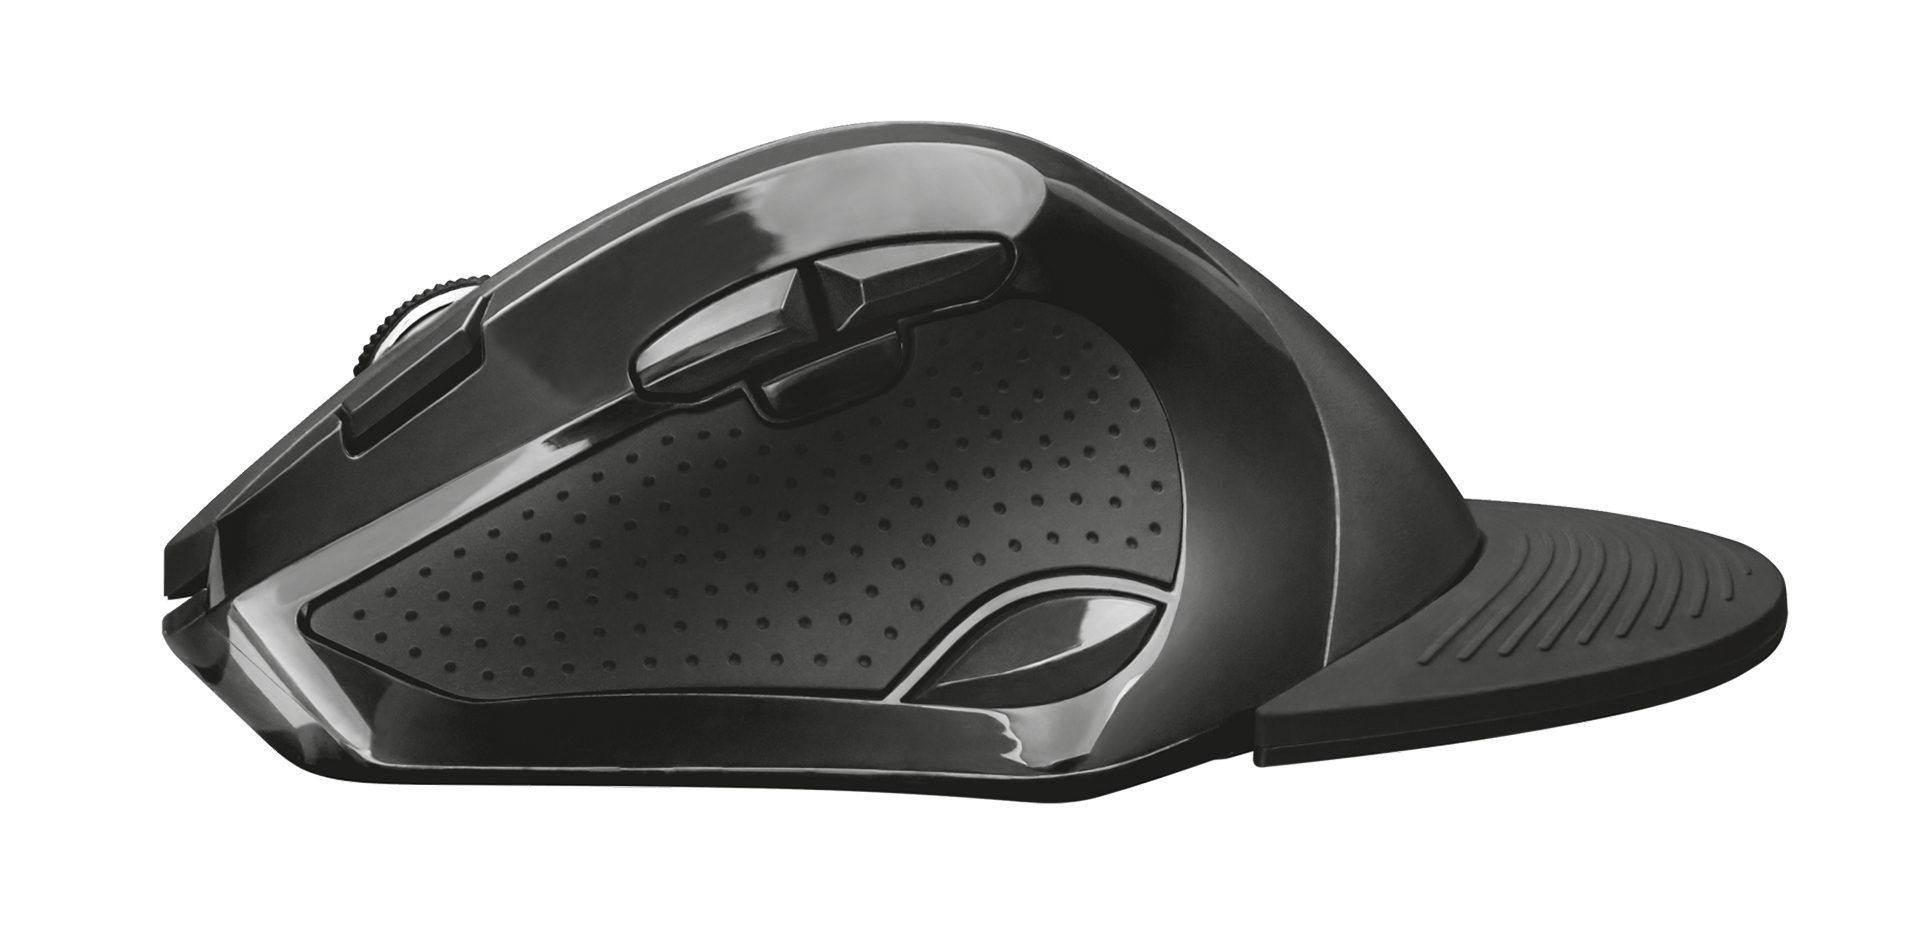 Vergo Ergonomic Mouse (9 knoppen)